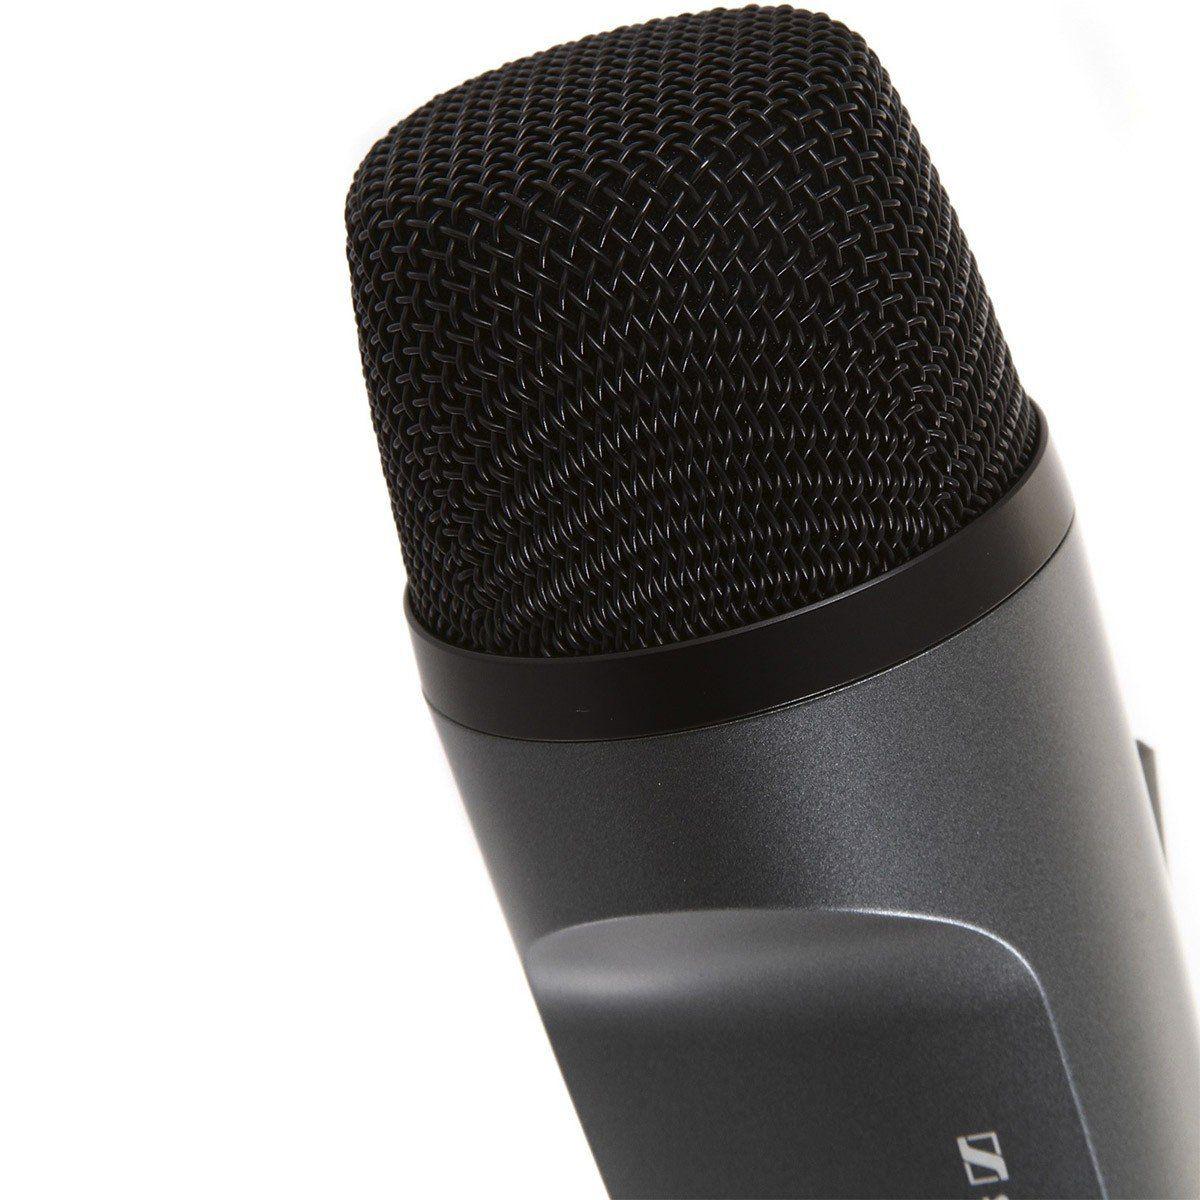 Sennheiser E602-II Microfone Dinâmico Sennheiser E602 II para Instrumentos